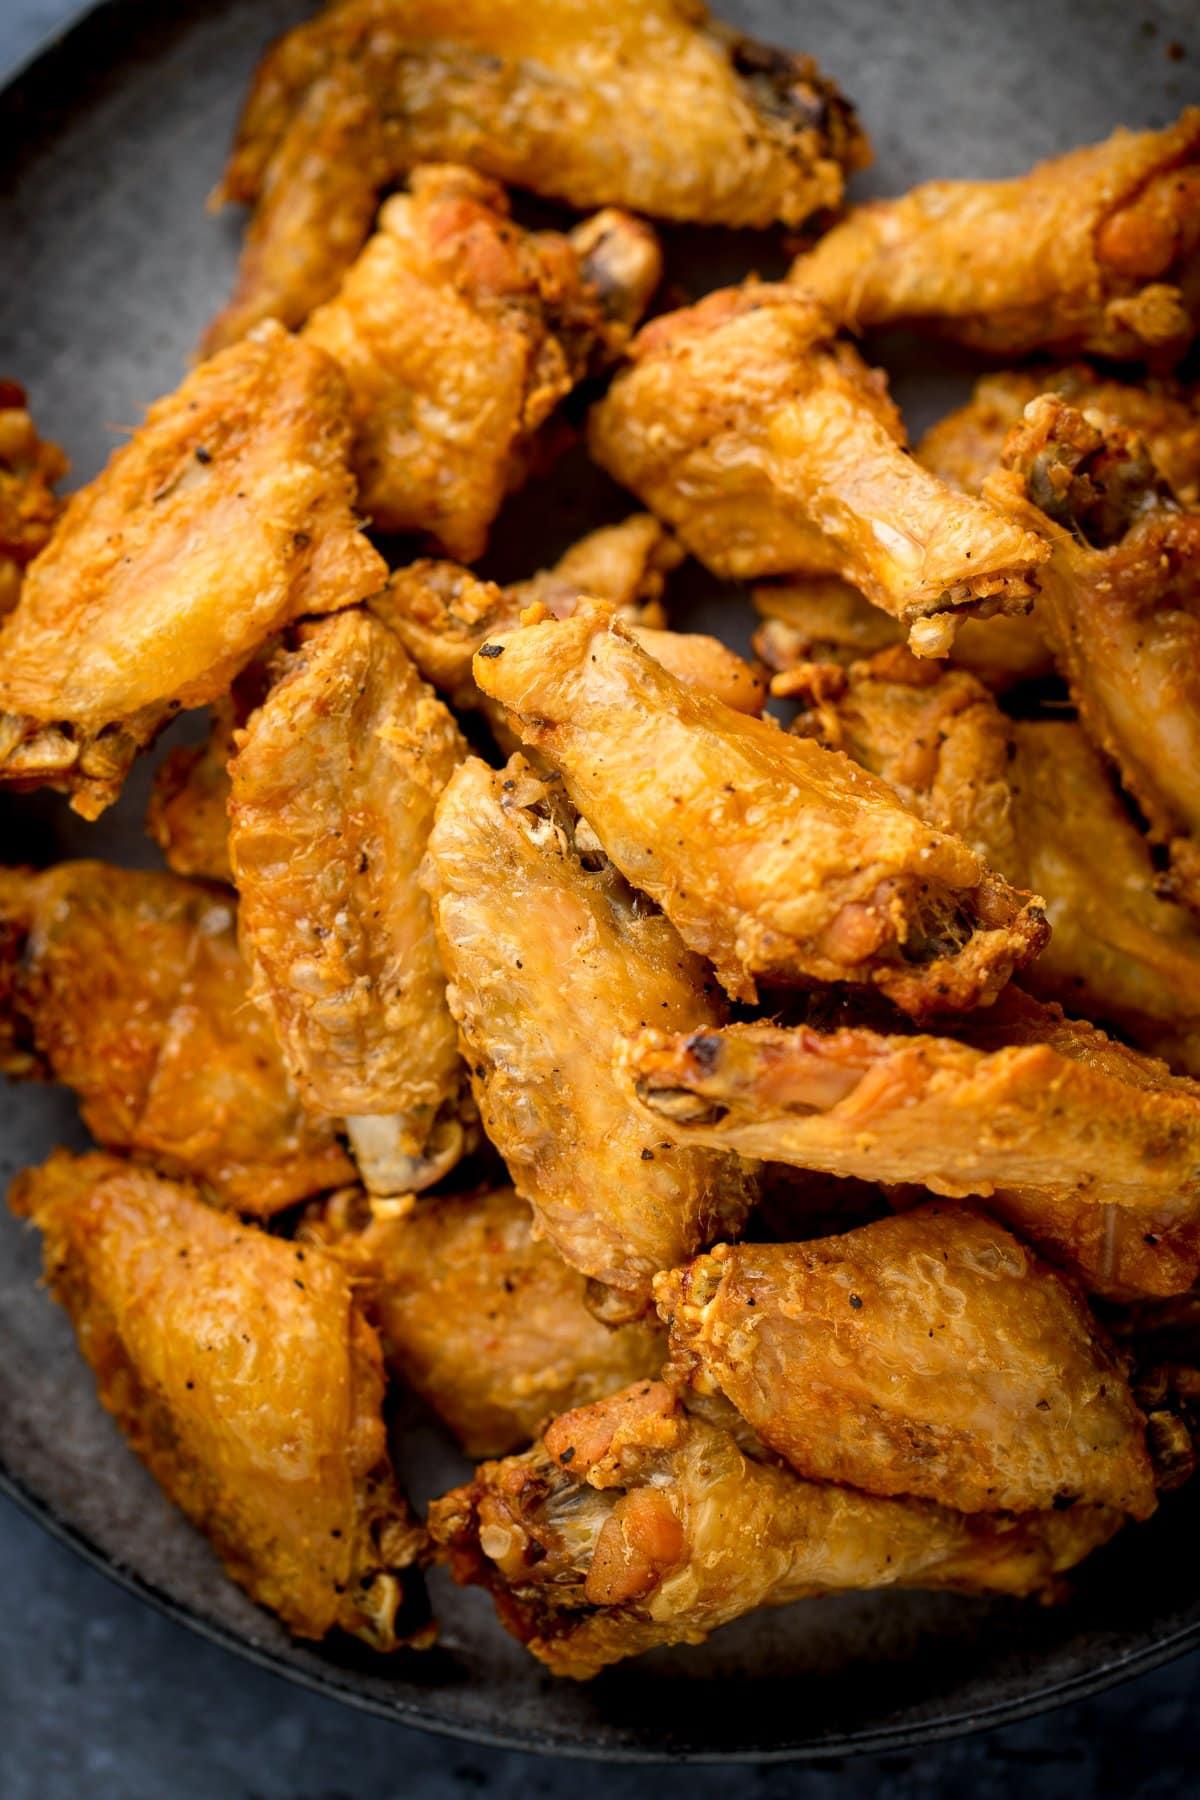 Pile of crispy chicken wings on a dark plate.